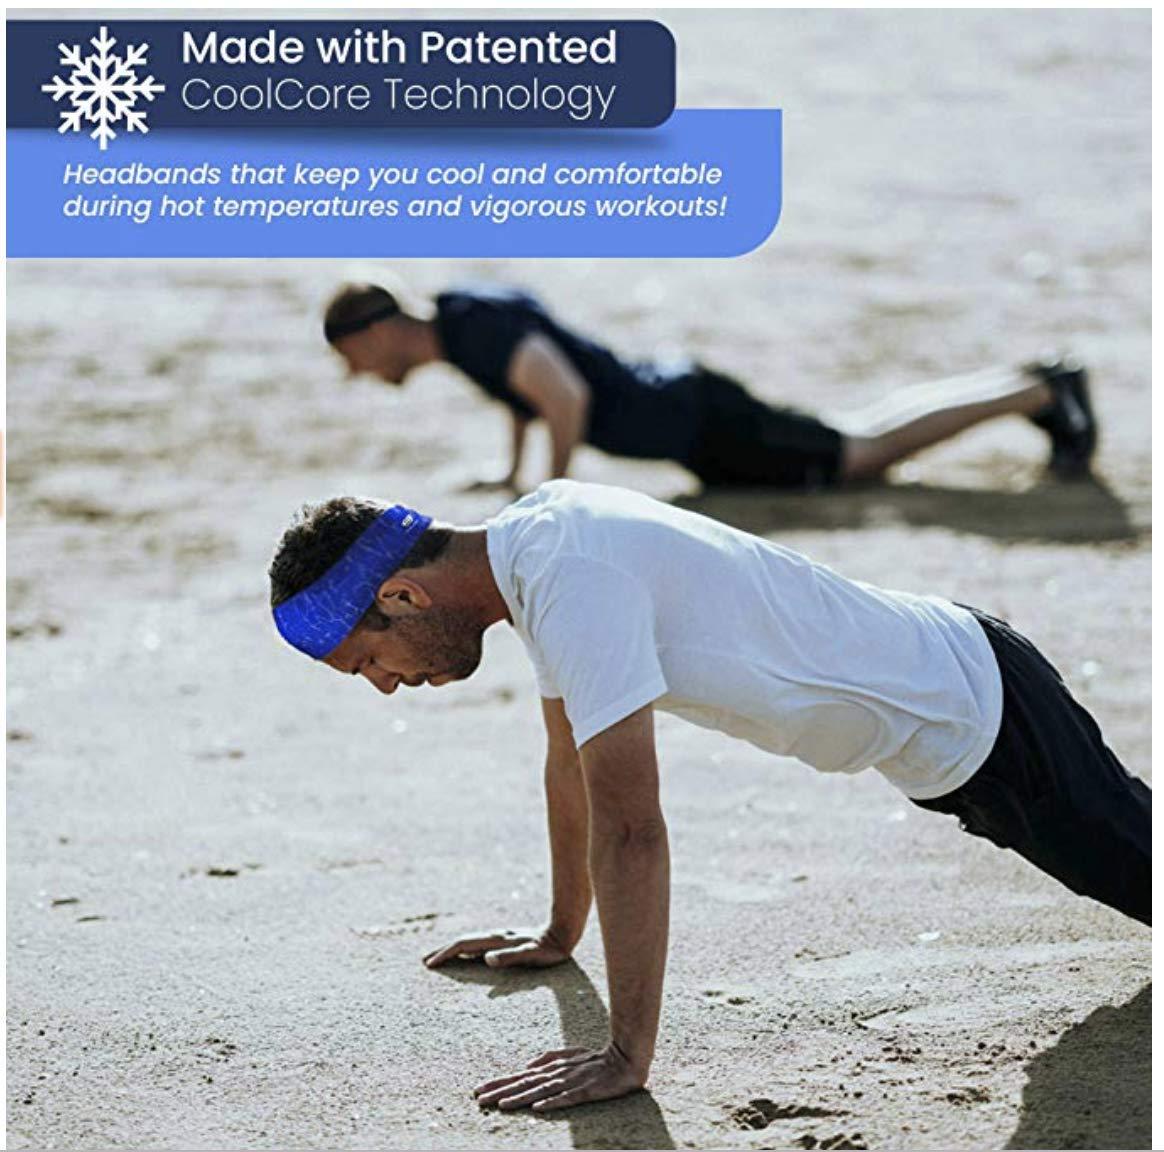 Cooling Headbands Moisture Wicking Womens Sweatband & Sports Headband | Workouts Cardio Running Yoga (Construction Orange) by Bani Bands (Image #3)